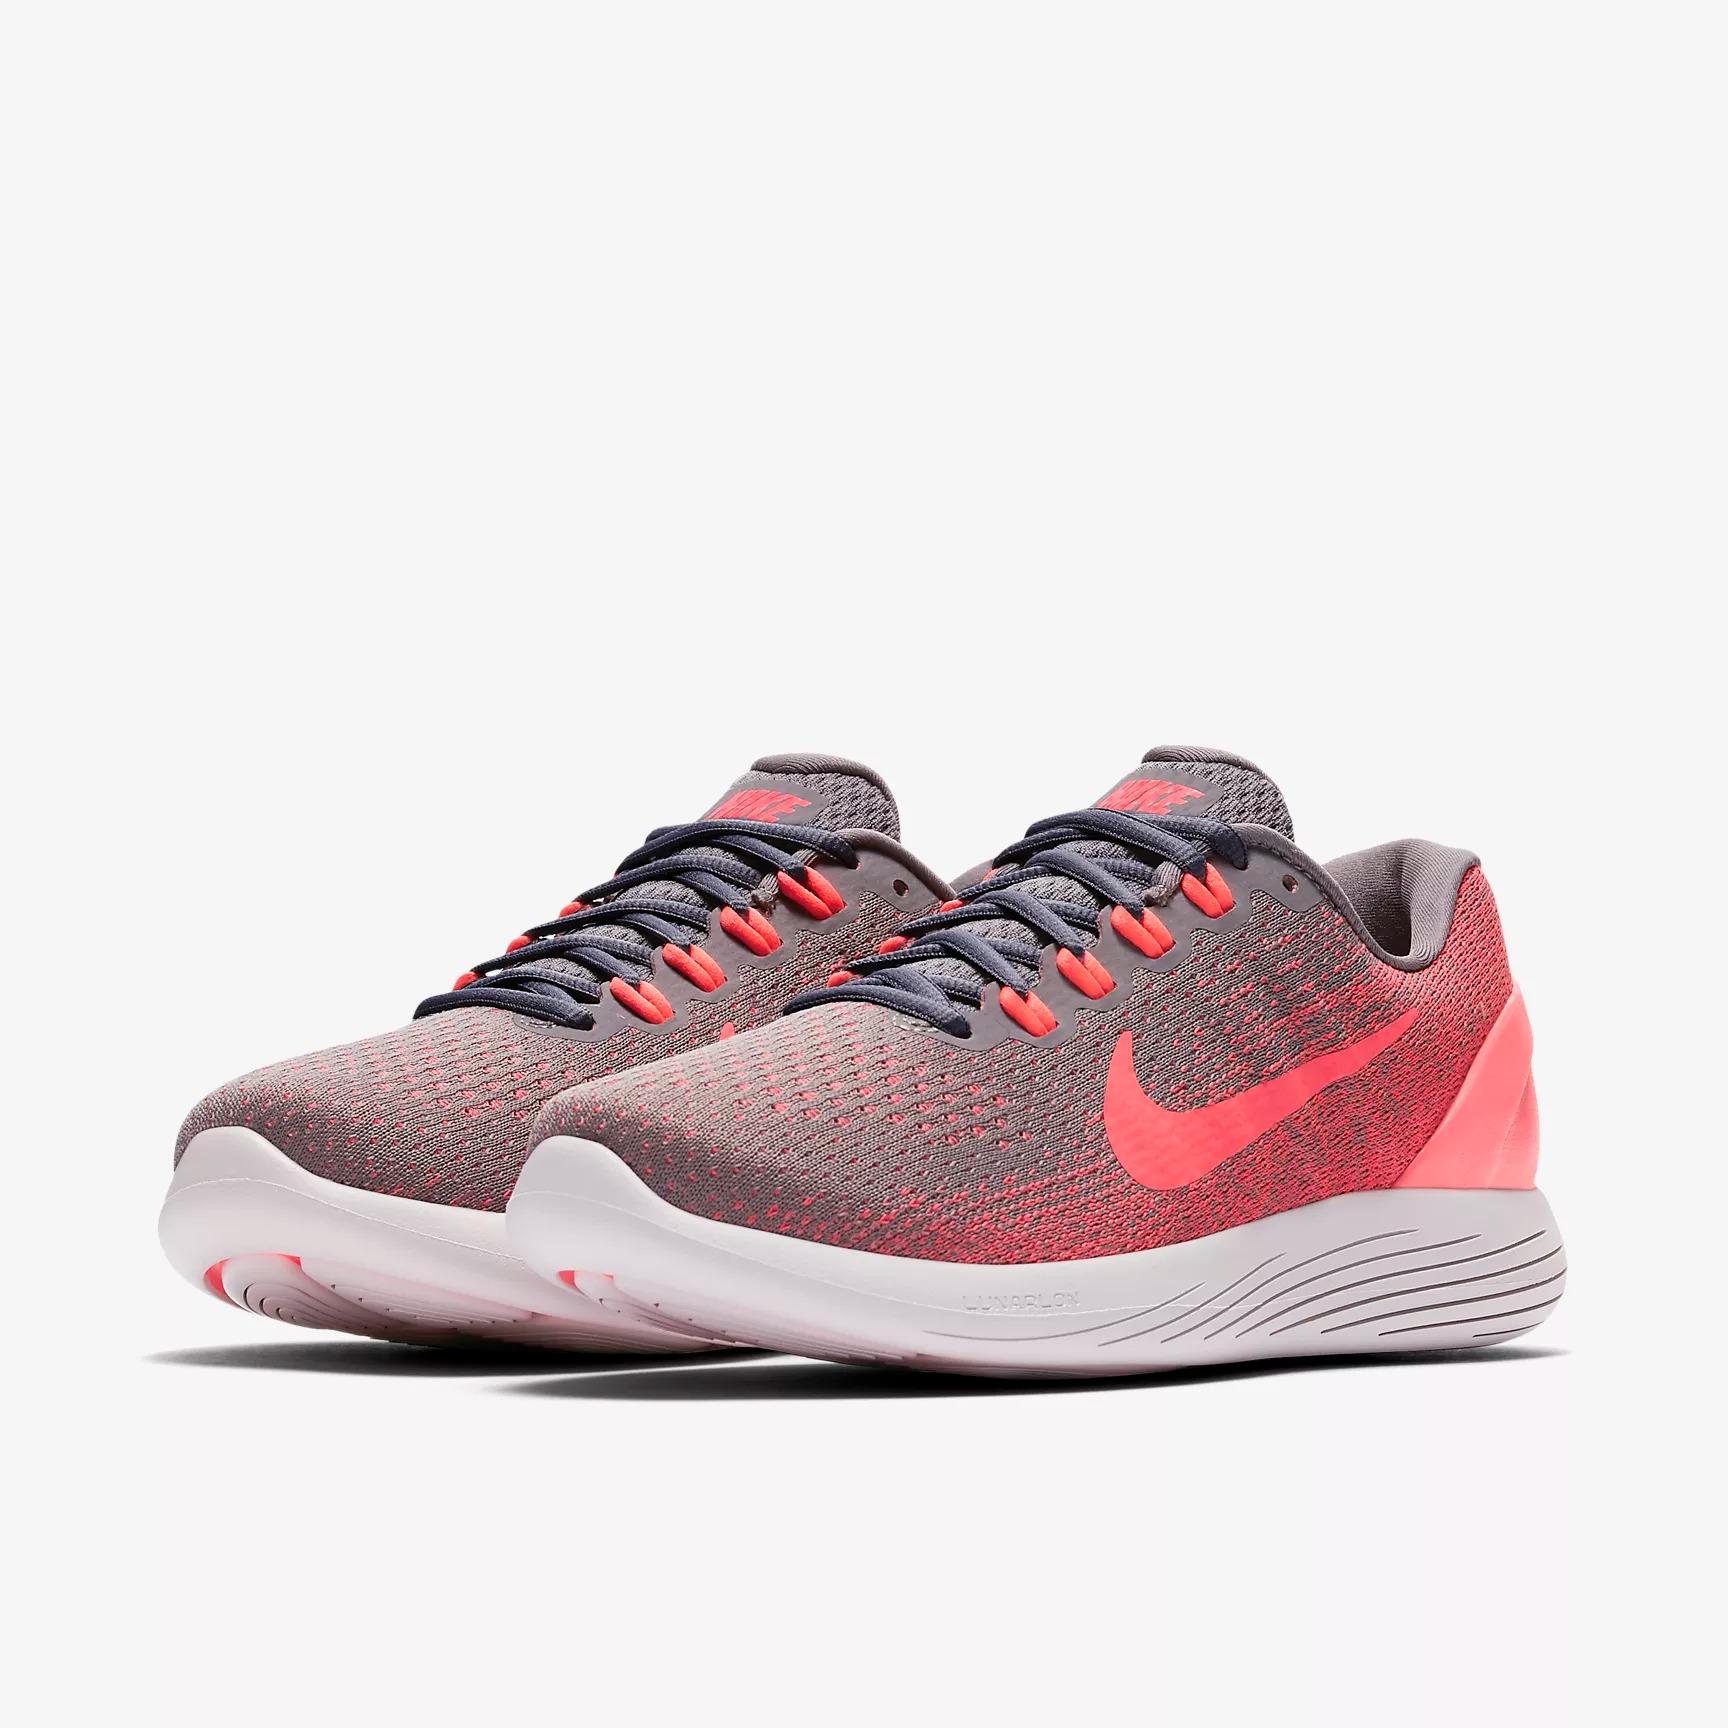 21c2e41fc280c Nike Wmns LunarGlide 9 Running Shoes - SPORT SHOES RUNNING SHOES -  Superfanas.lt